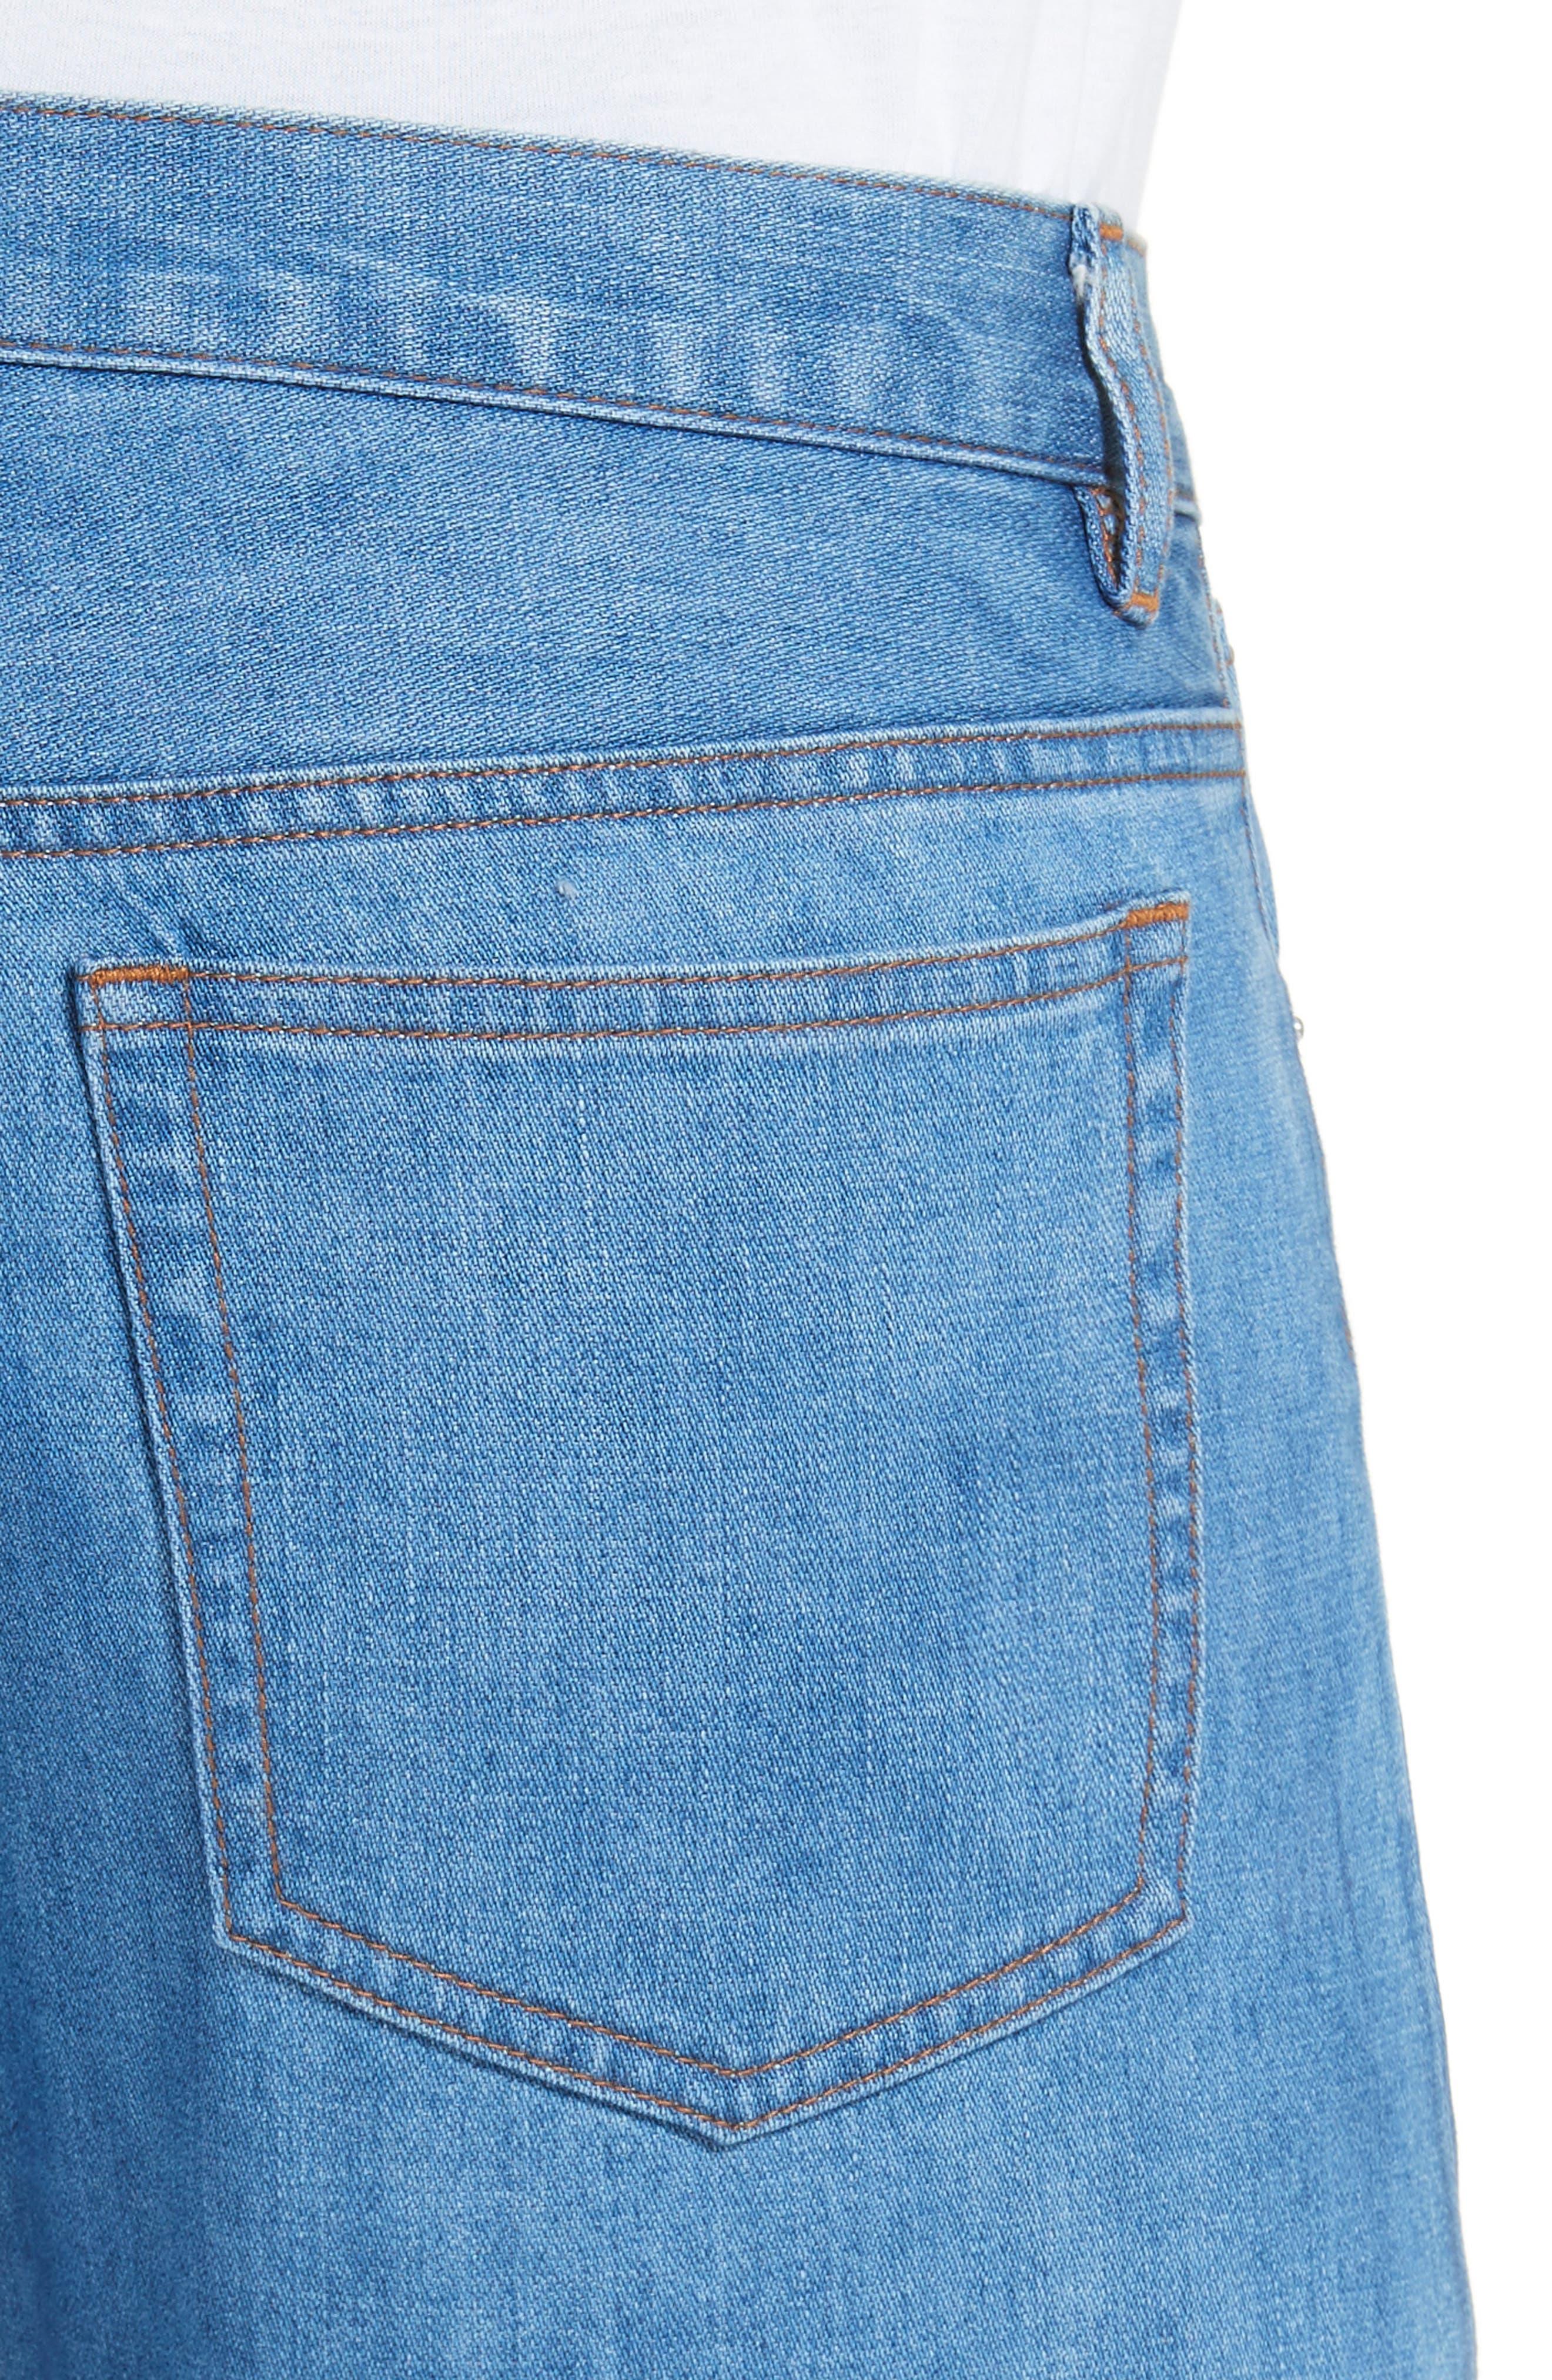 Petit New Standard Slim Fit Jeans,                             Alternate thumbnail 3, color,                             461